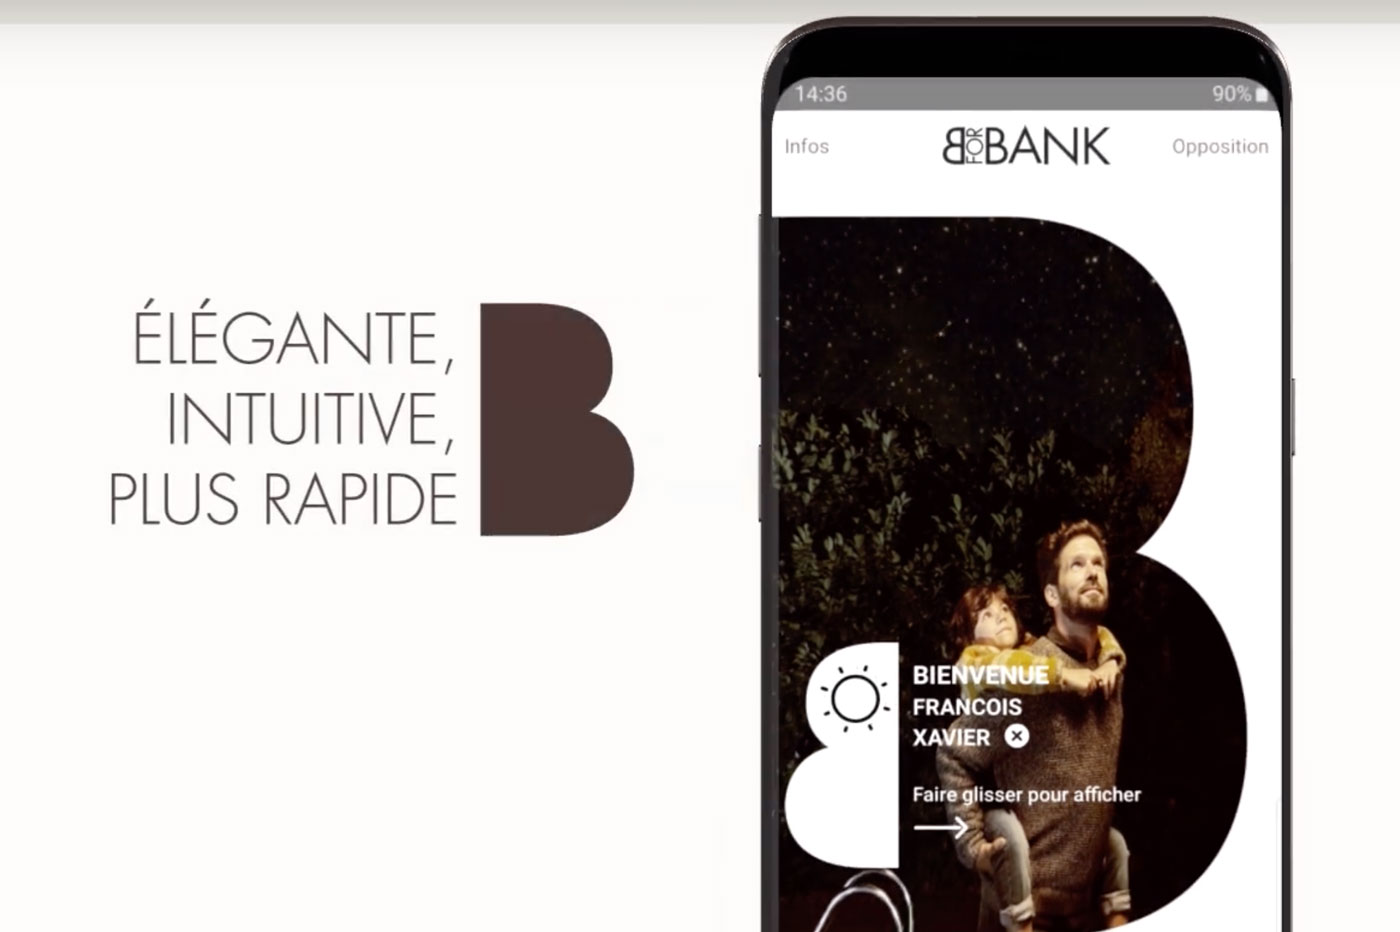 BforBank Apple Pay